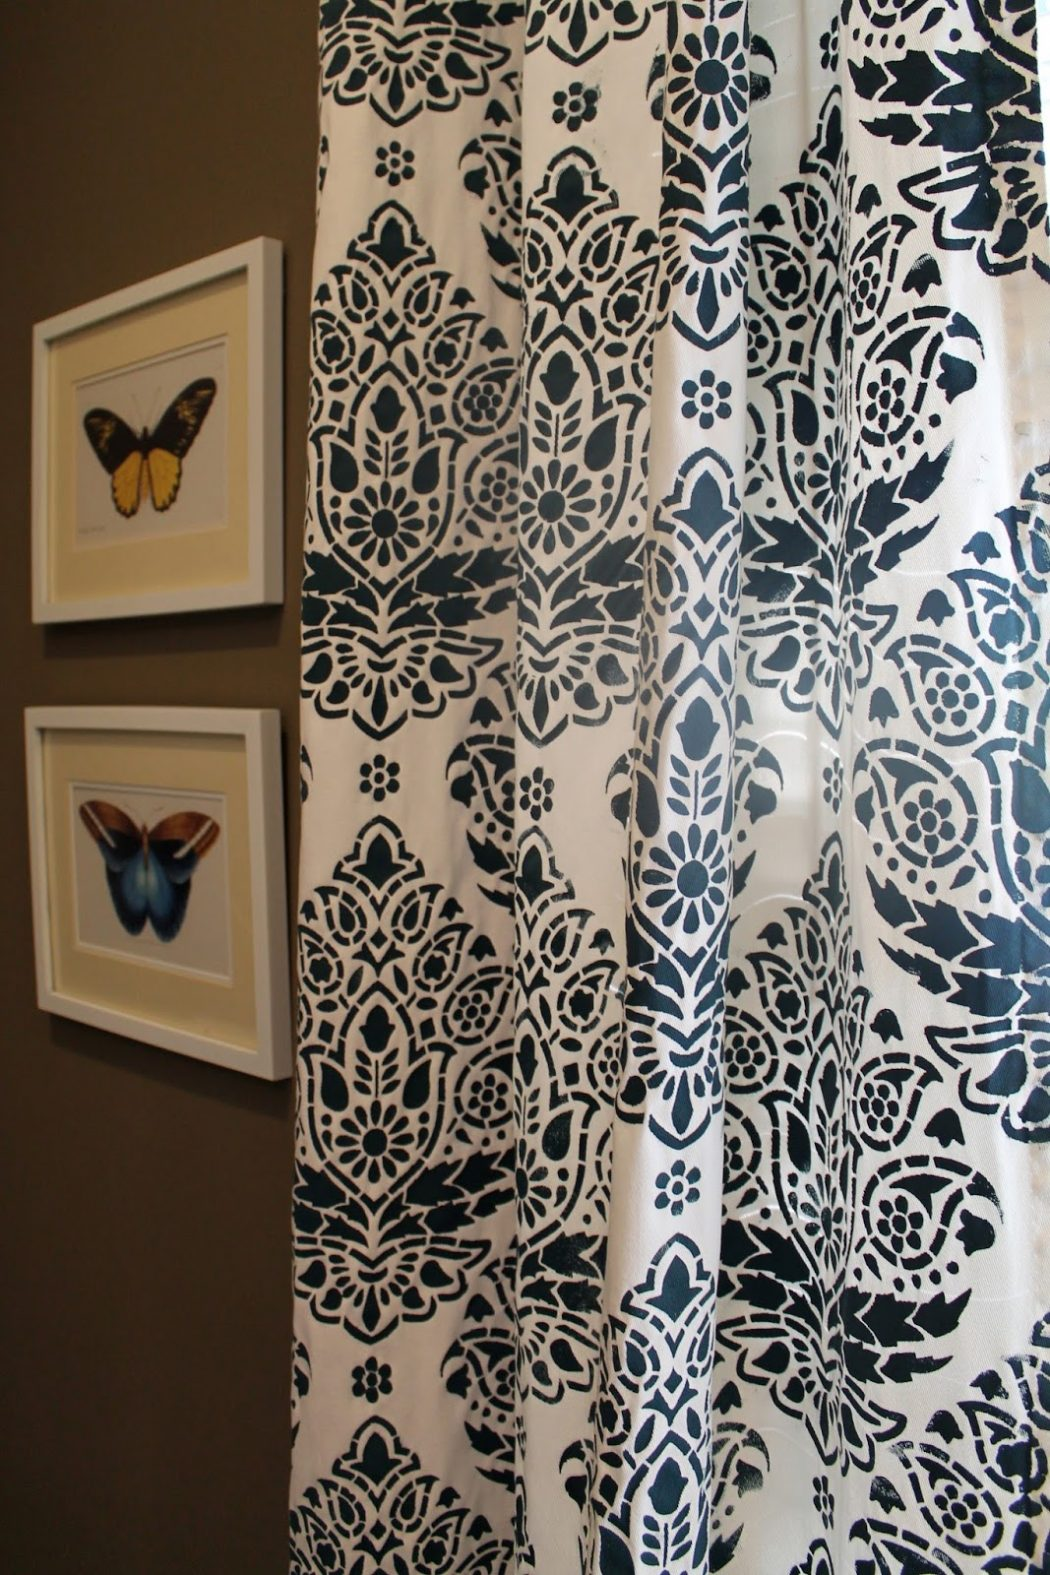 Stenciled-Curtains4 37+ Creative Curtains Design Ideas To DIY